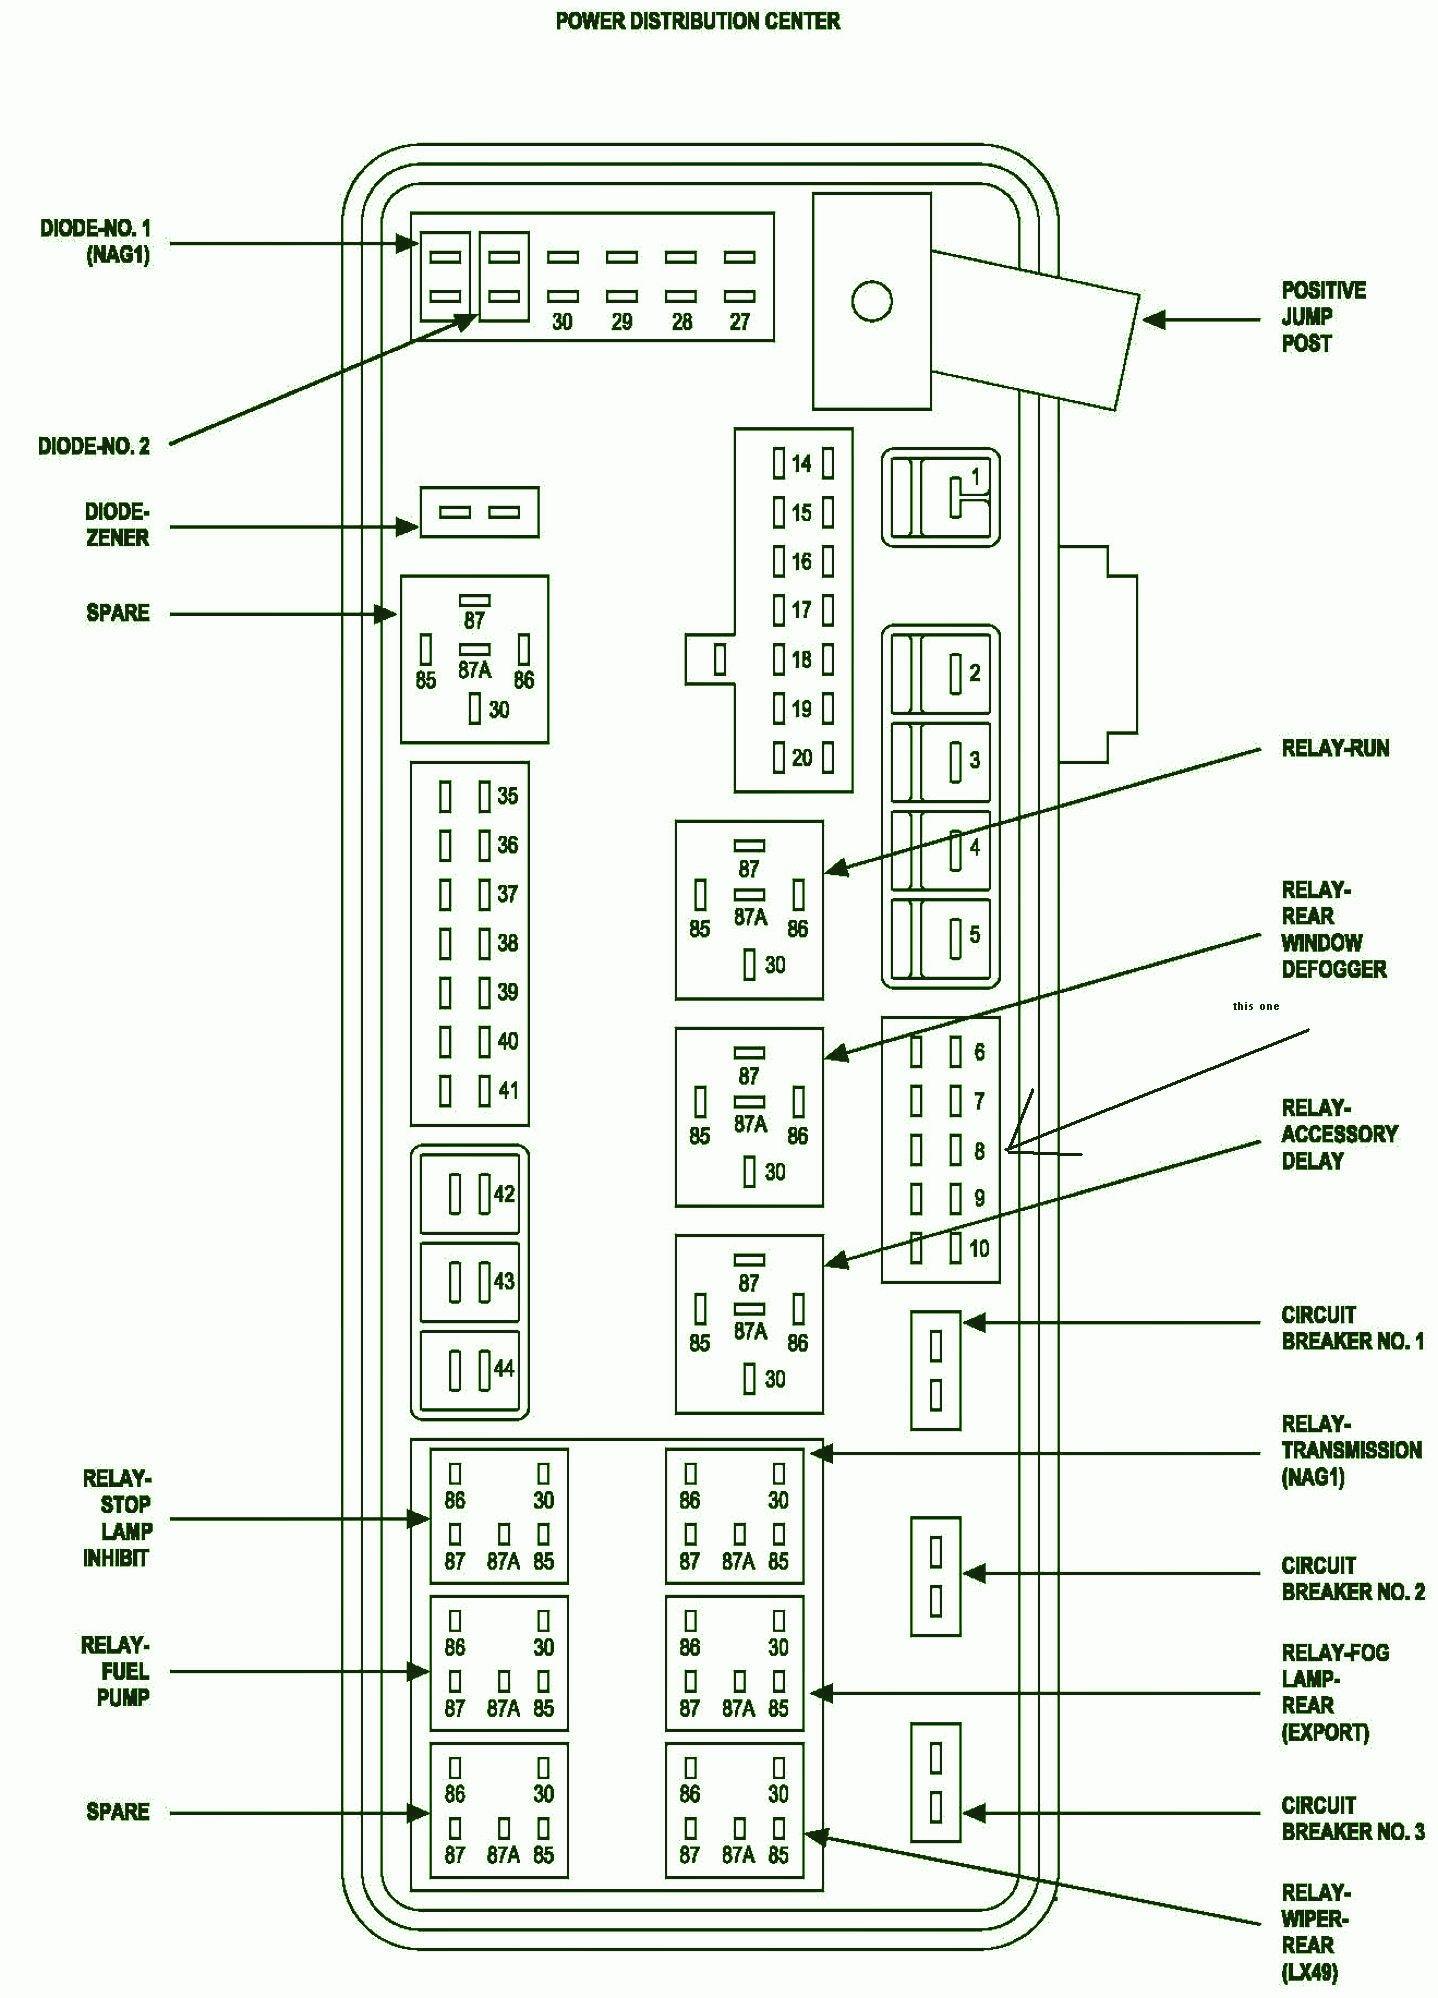 2005 Dodge Sprinter Fuse Box - 360 V8 Engine Diagram -  furnaces.tukune.jeanjaures37.frWiring Diagram Resource